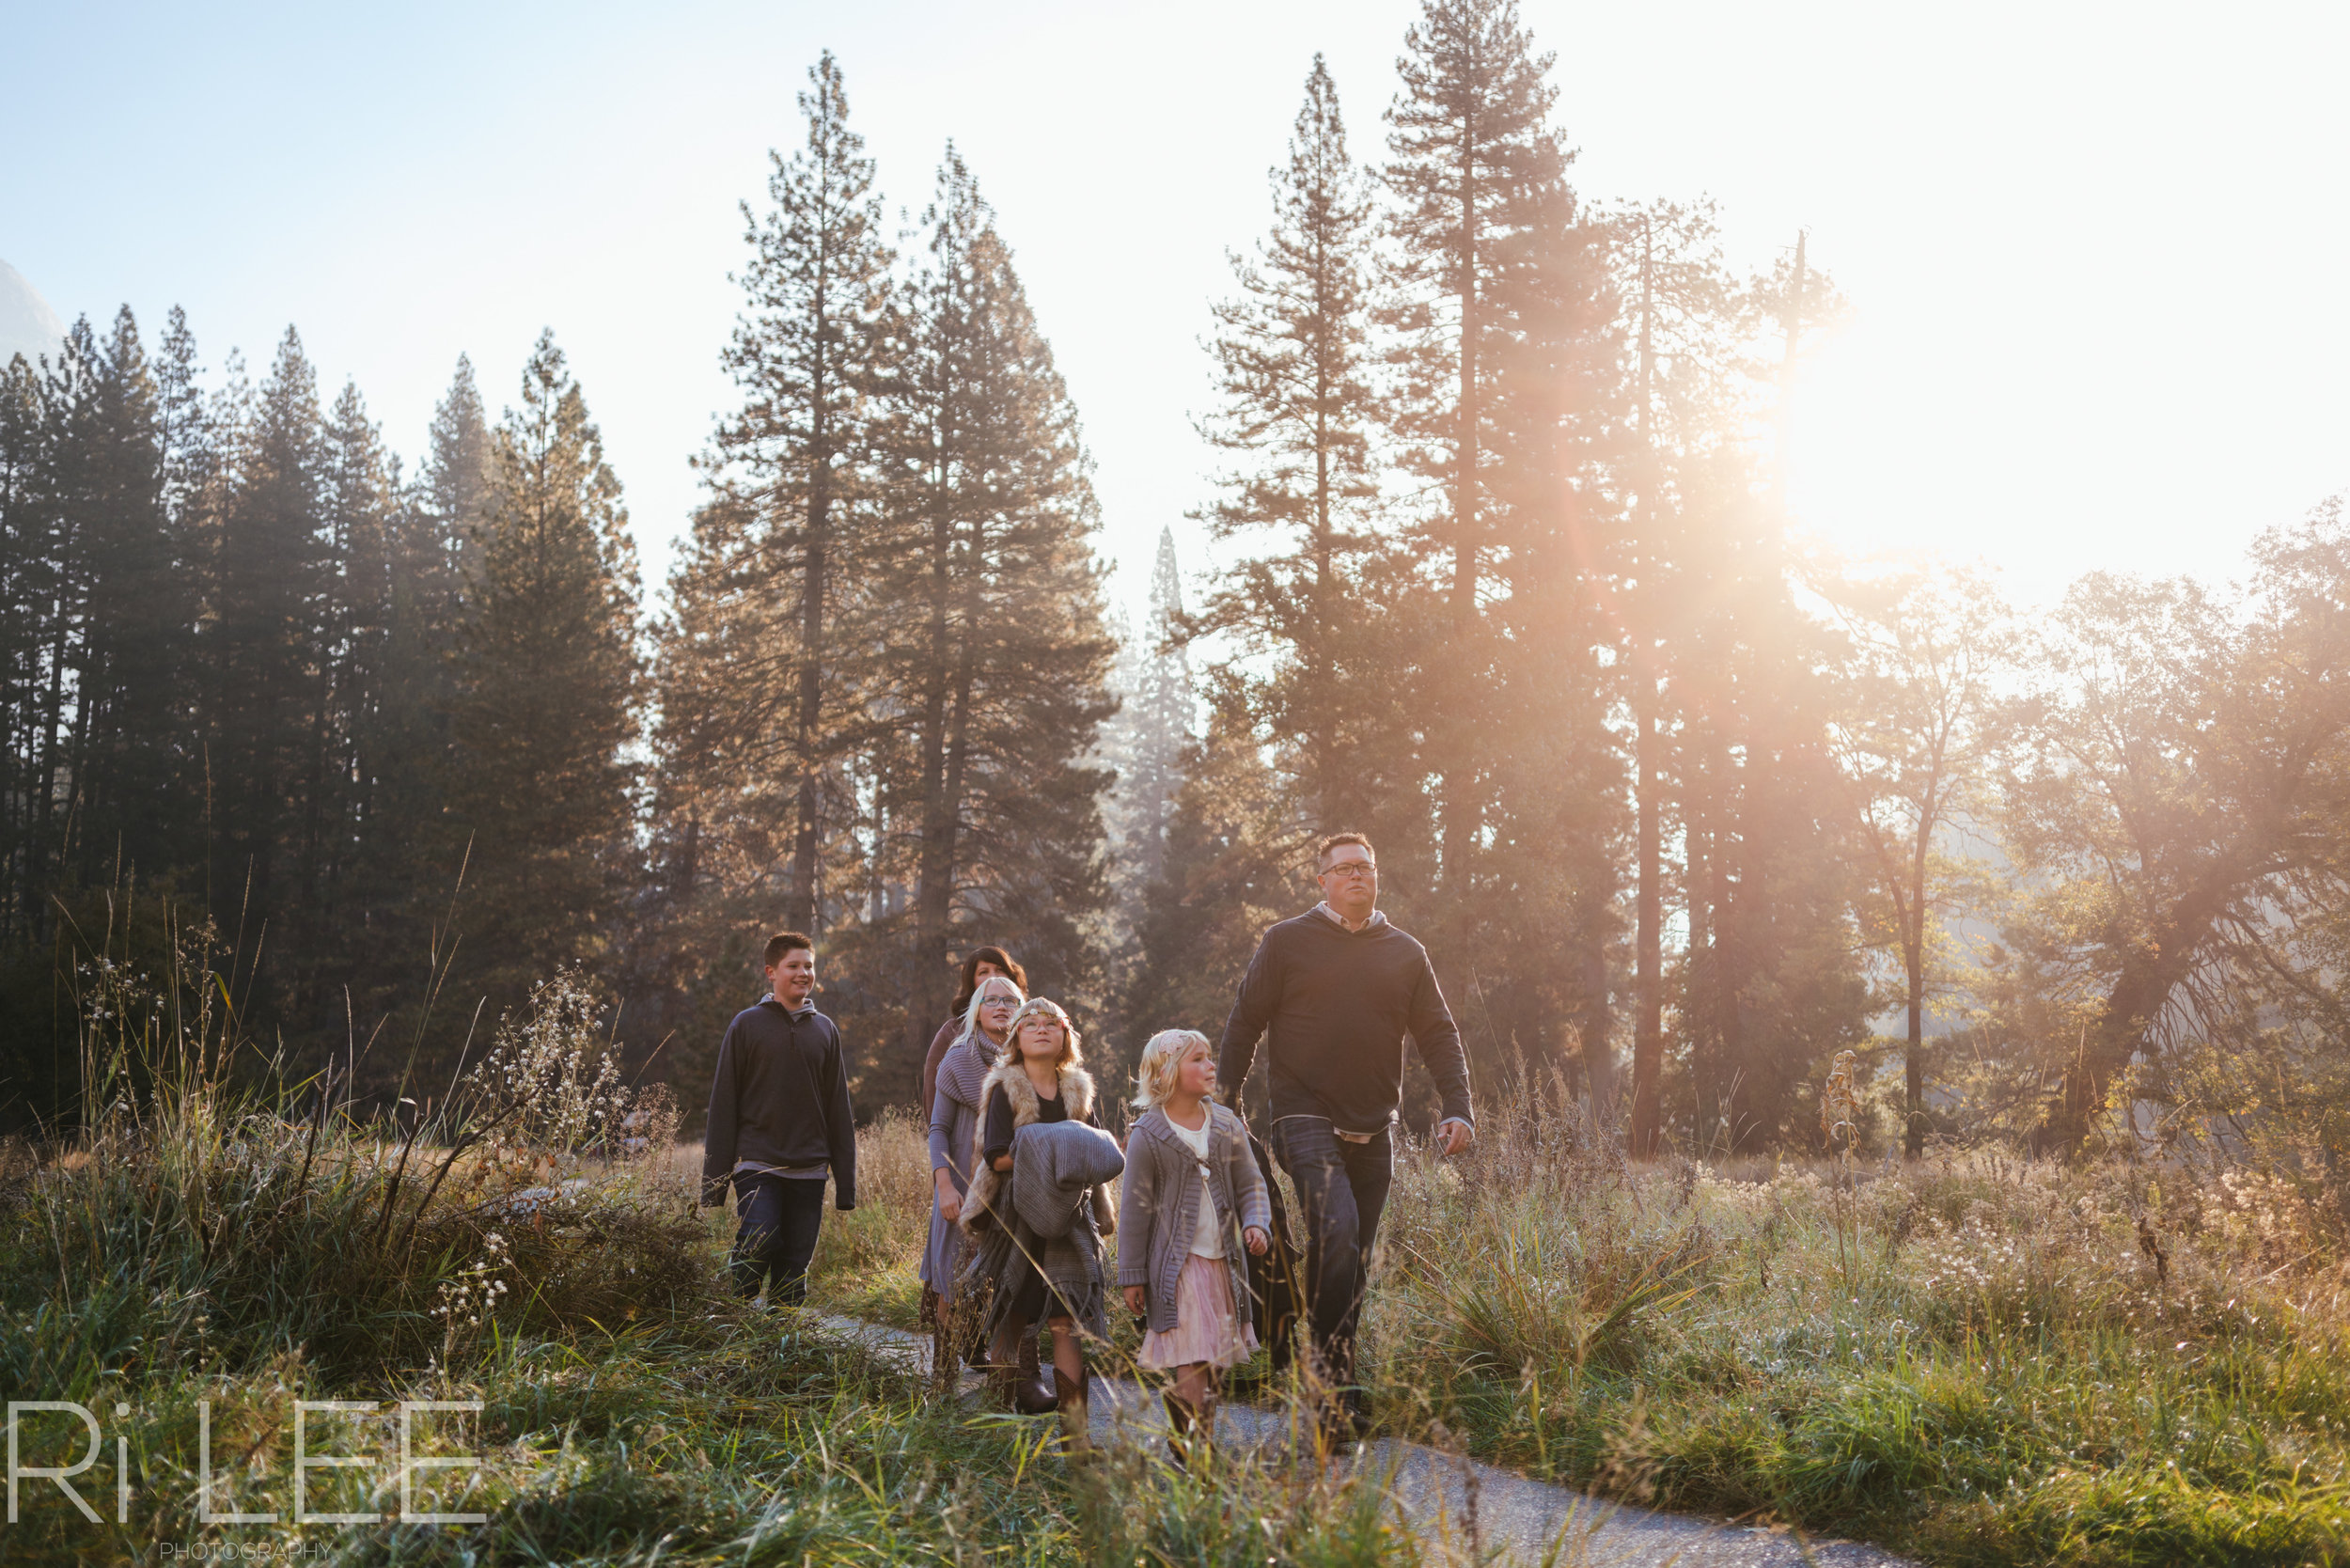 hunt-family-rilee-web (17 of 22).jpg